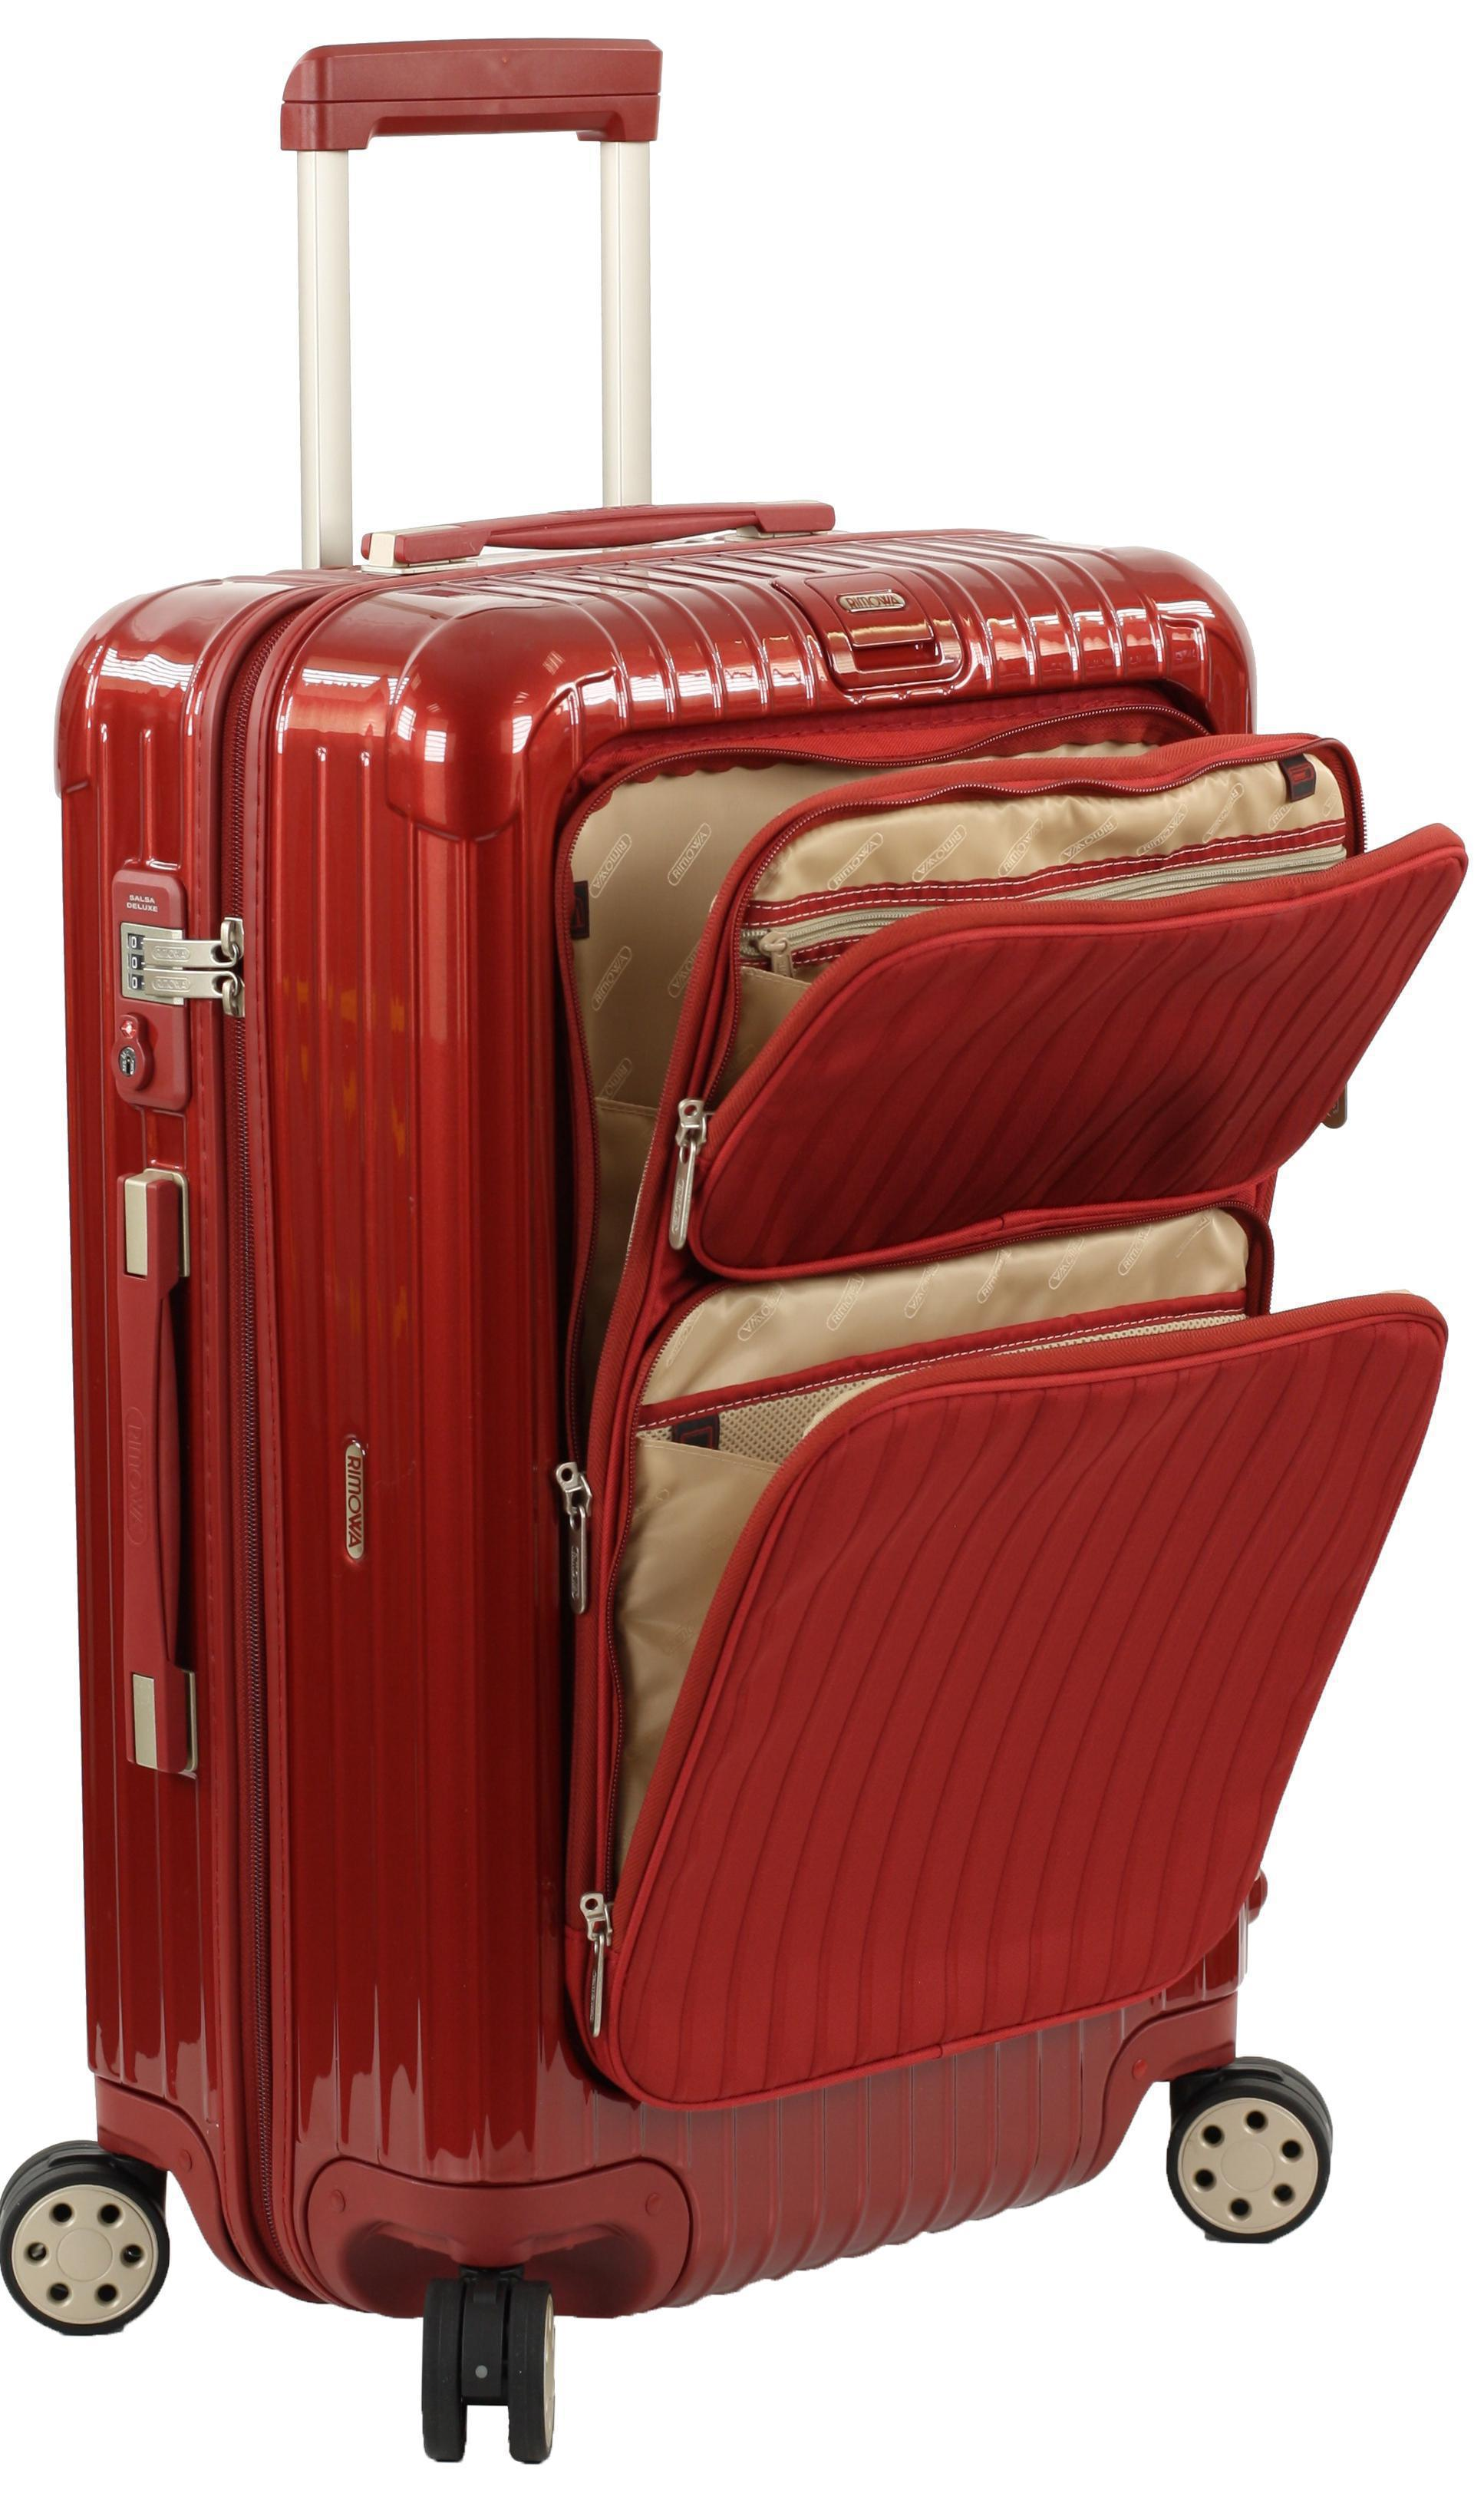 Rimowa salsa deluxe hybrid cabin multiwheel 52 iata for Rimowa salsa deluxe hybrid iata cabin multiwheel